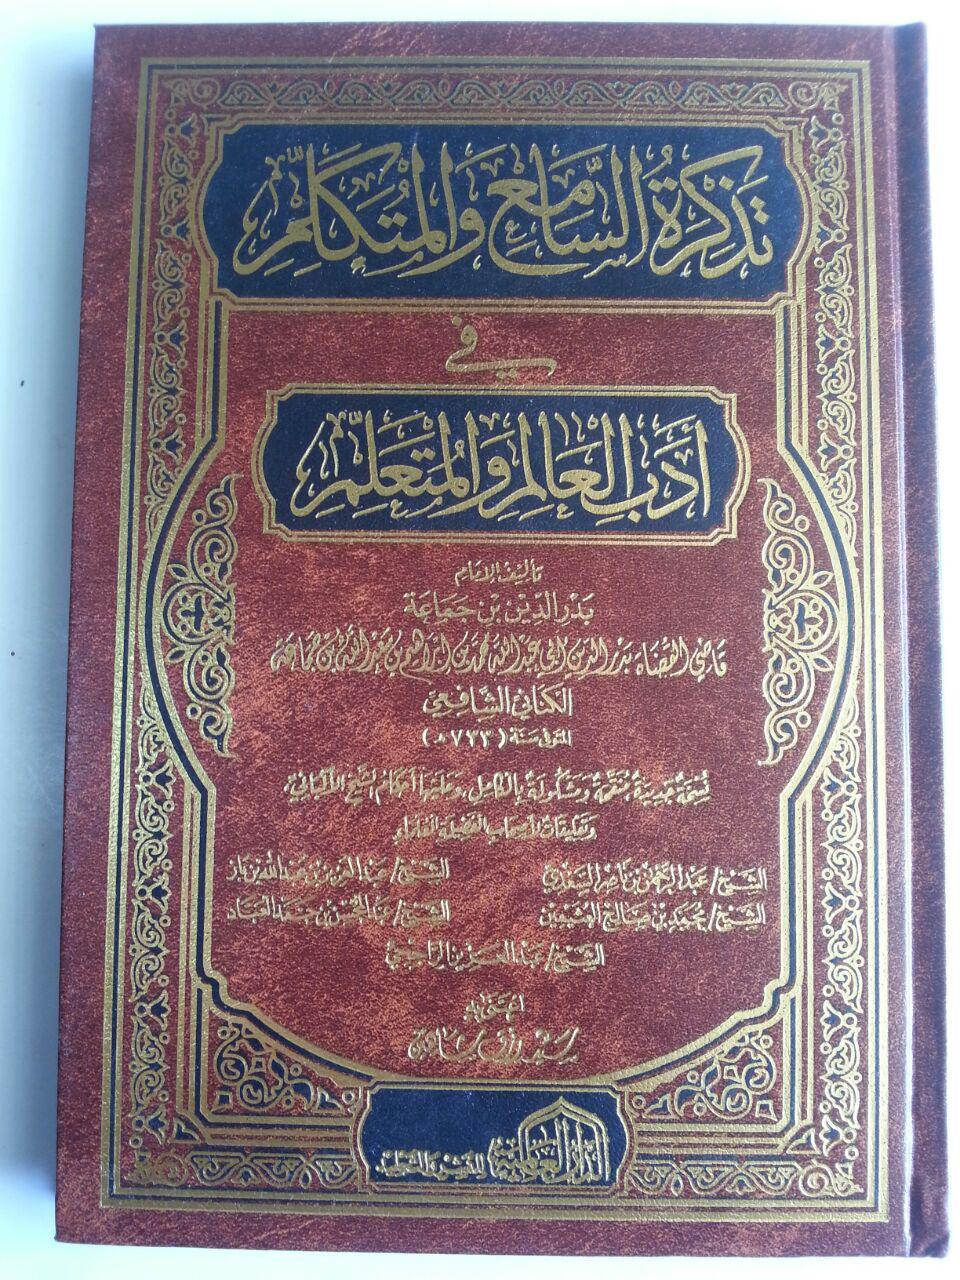 Kitab Tadzkiratus Sami Wal Mutakallim Fi Adabil Ilmi Wal Mutaallim cover